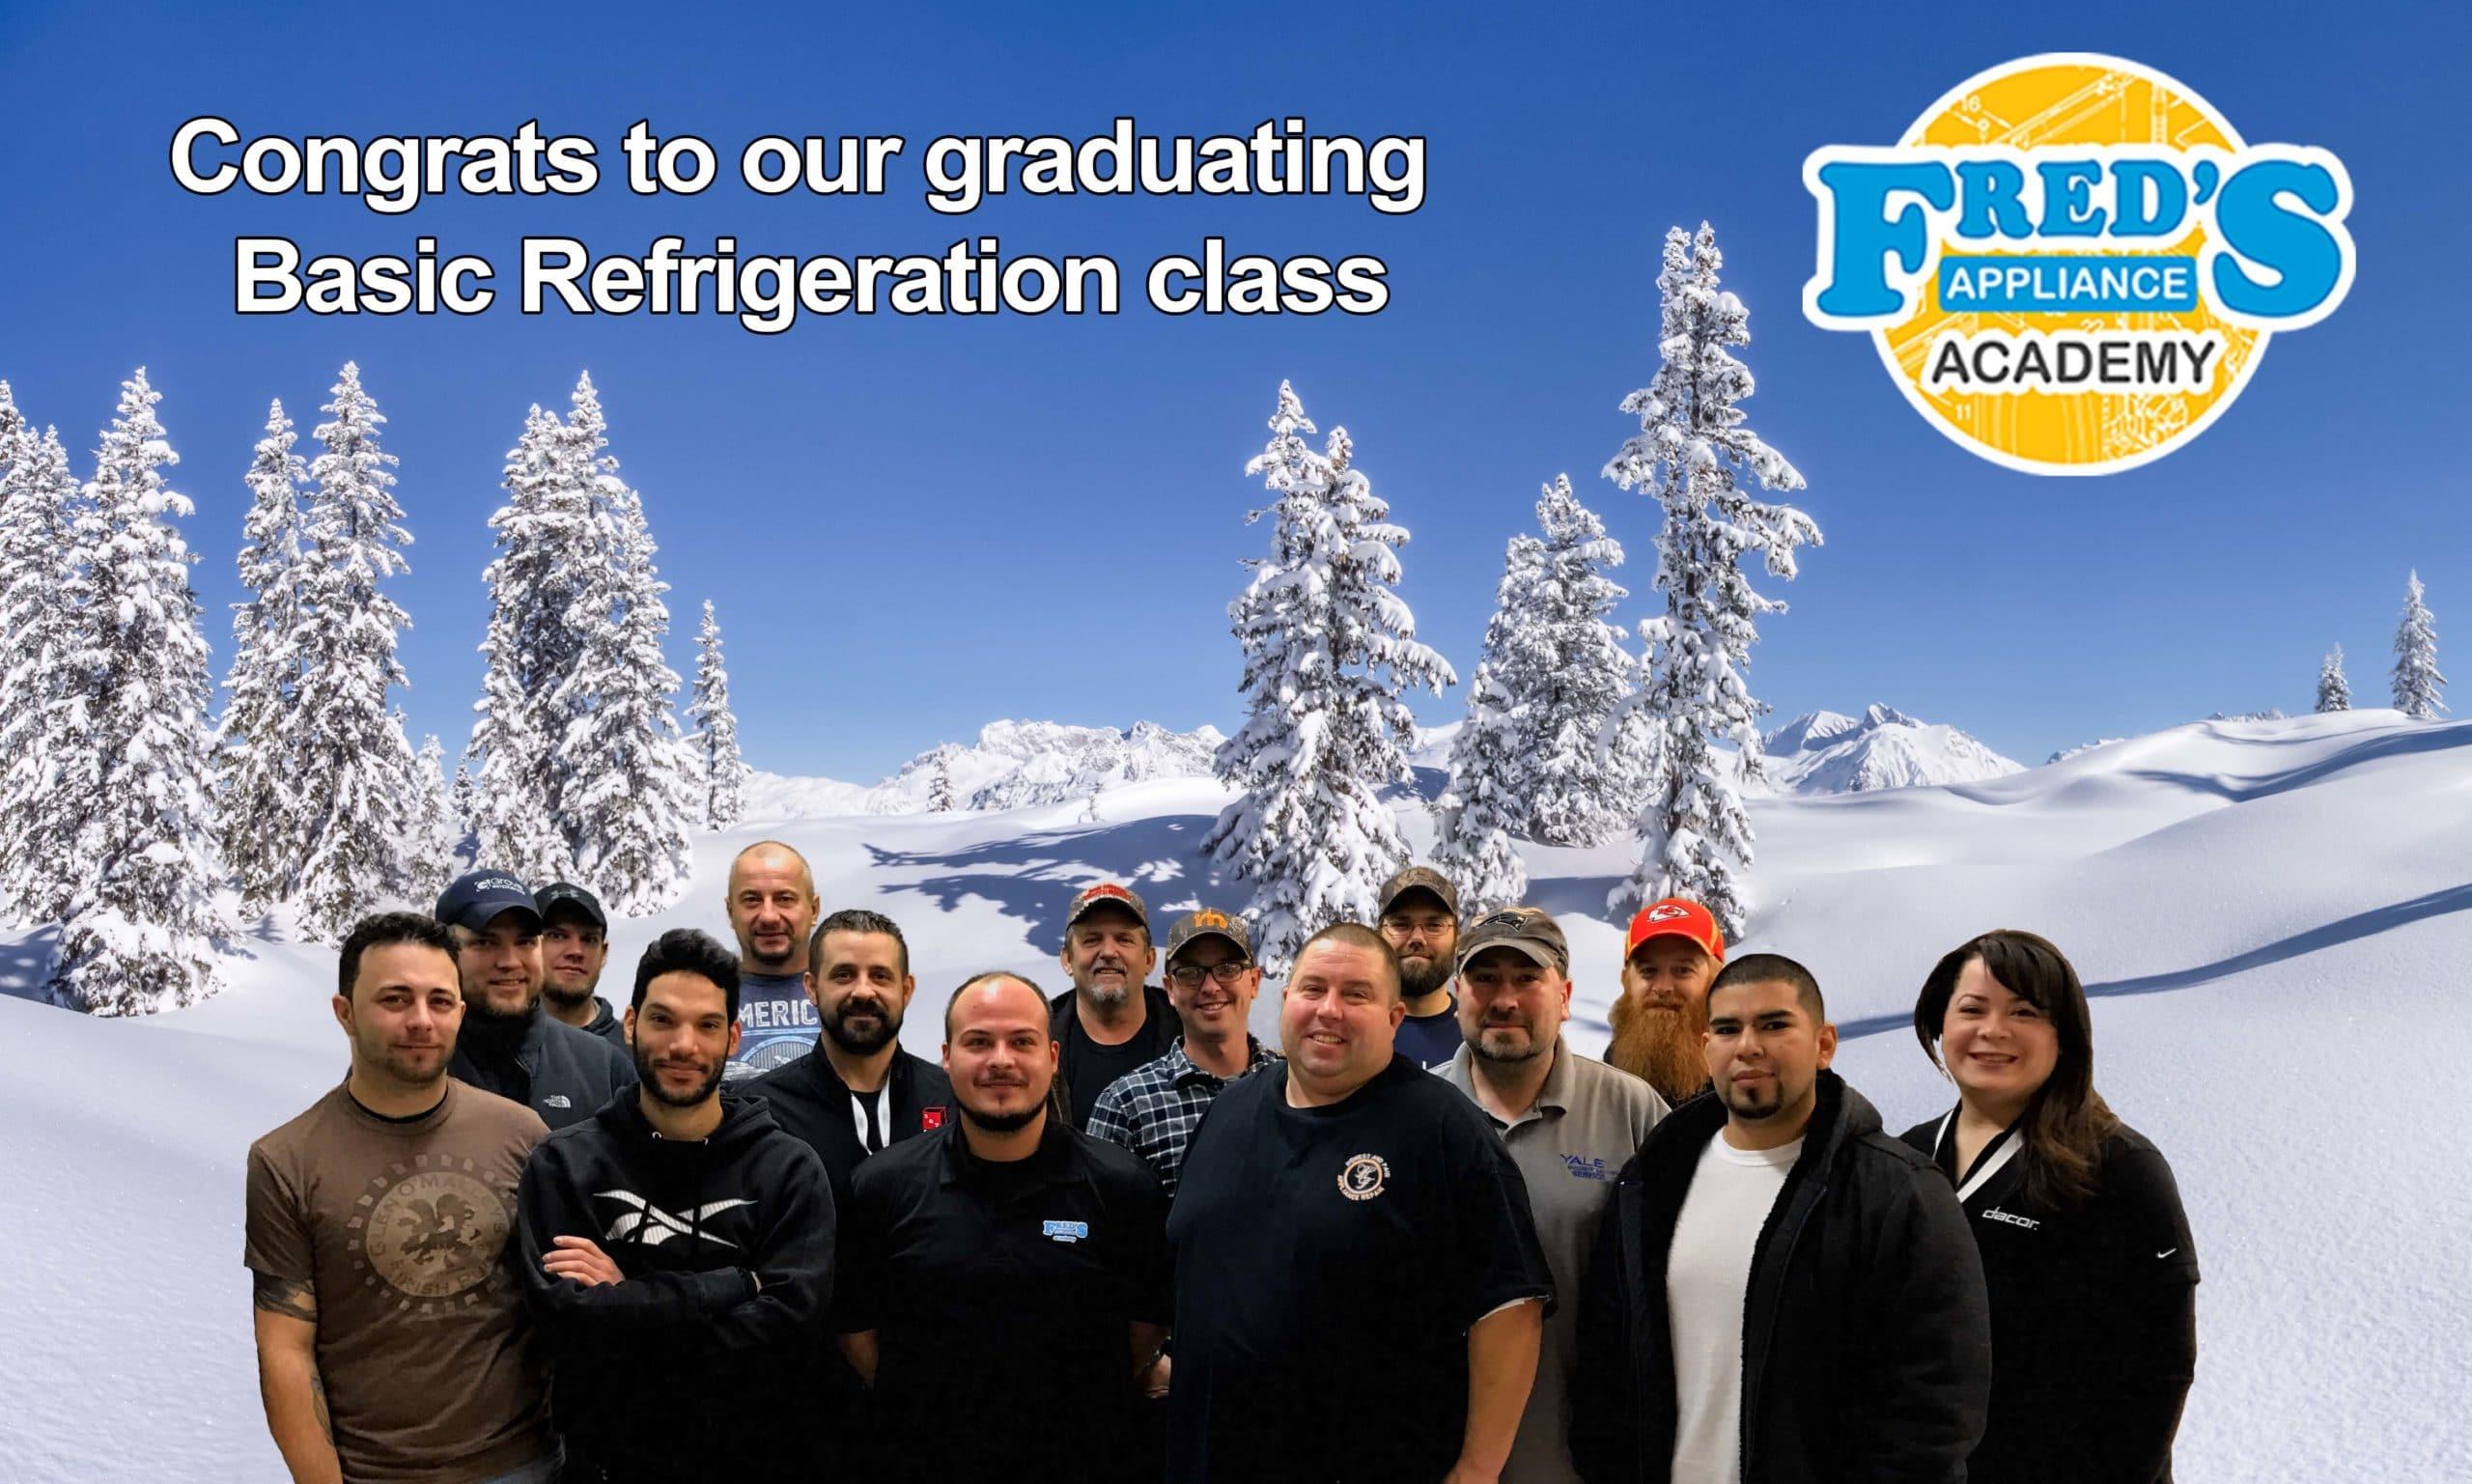 basic refrigeration